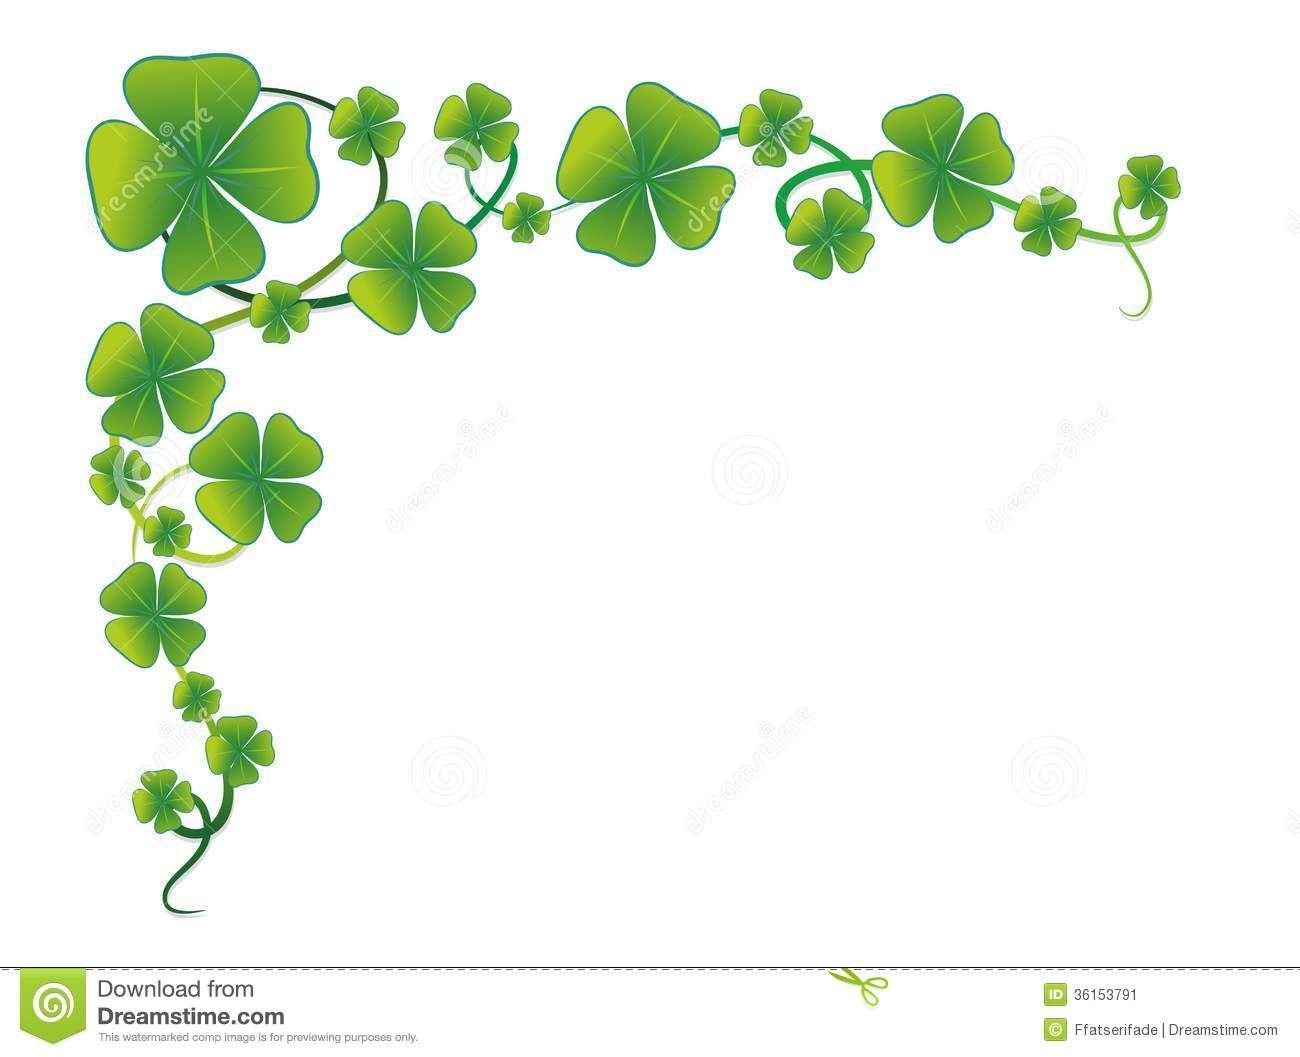 hight resolution of 4 h clover border stock image cloverleaf